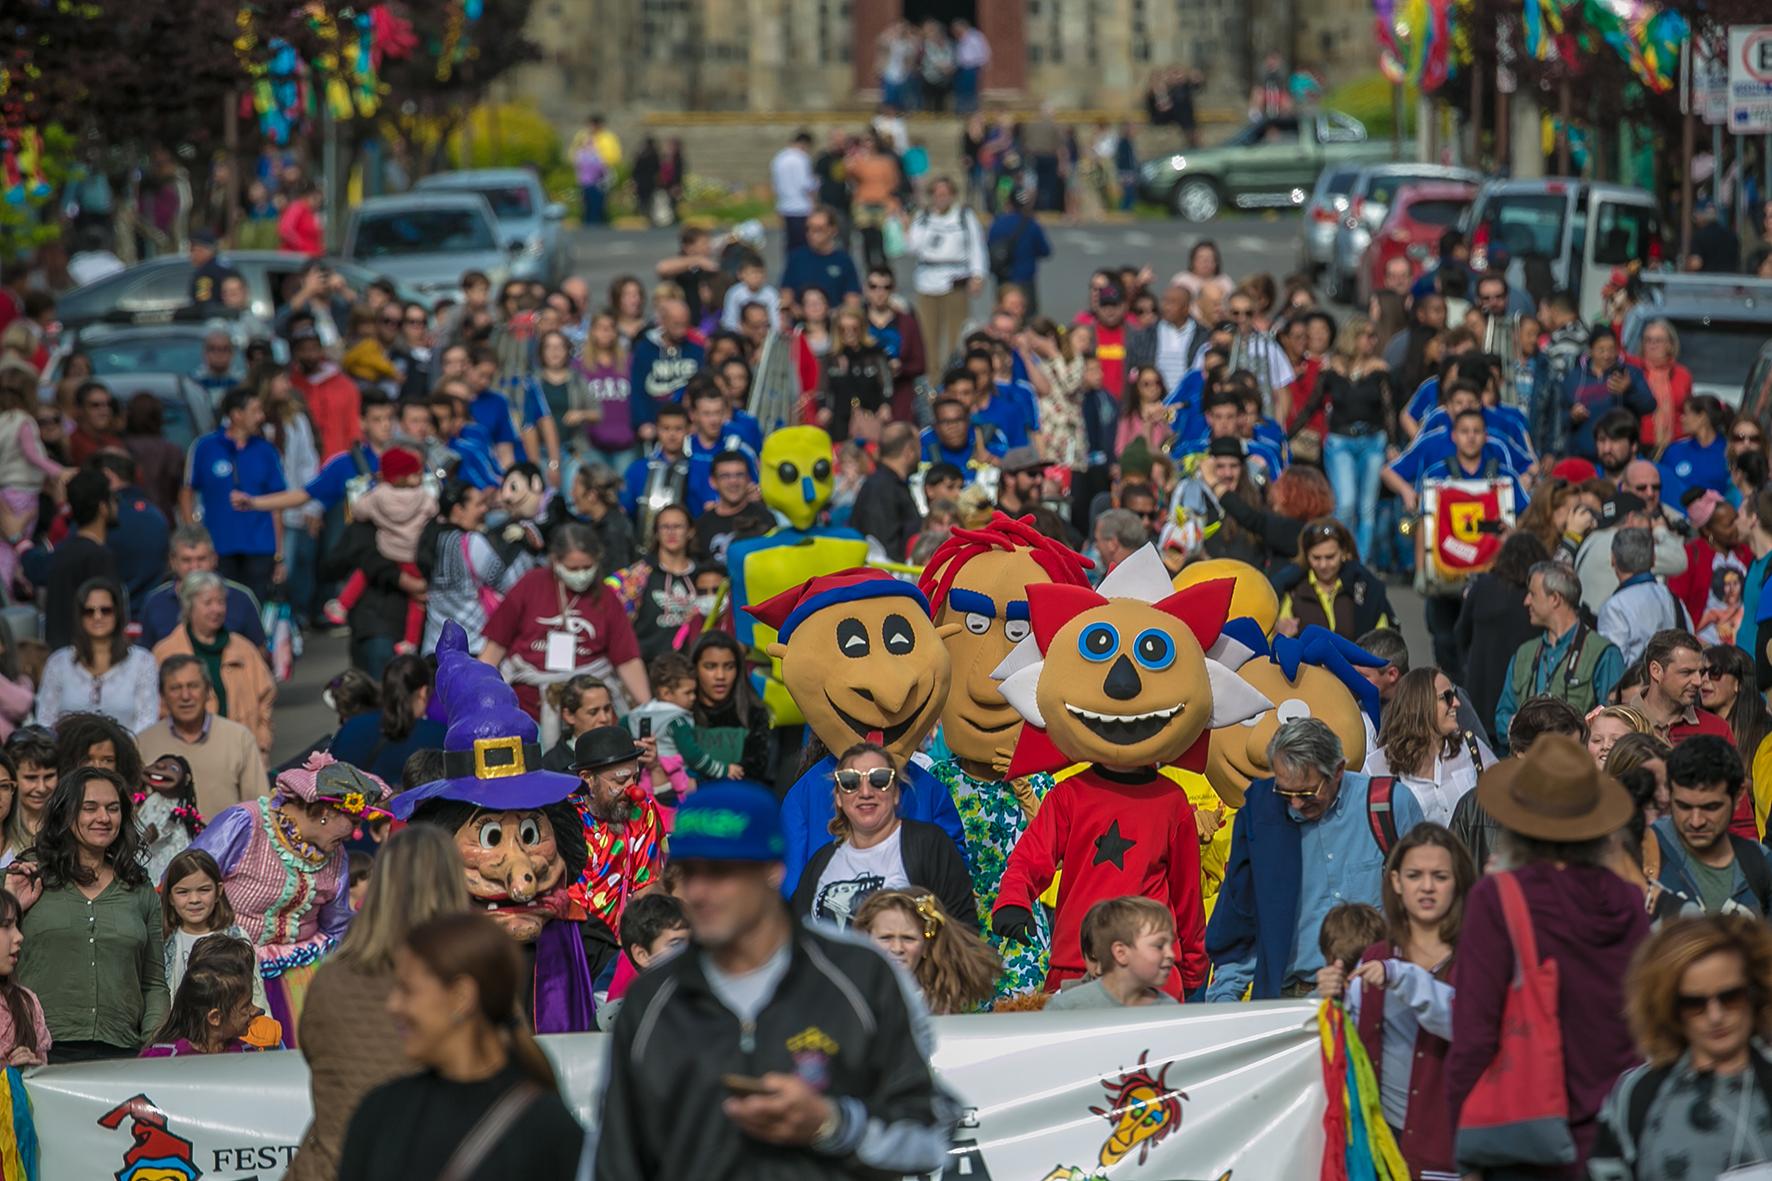 31º Festival de Bonecos reunirá espetáculos de cinco países